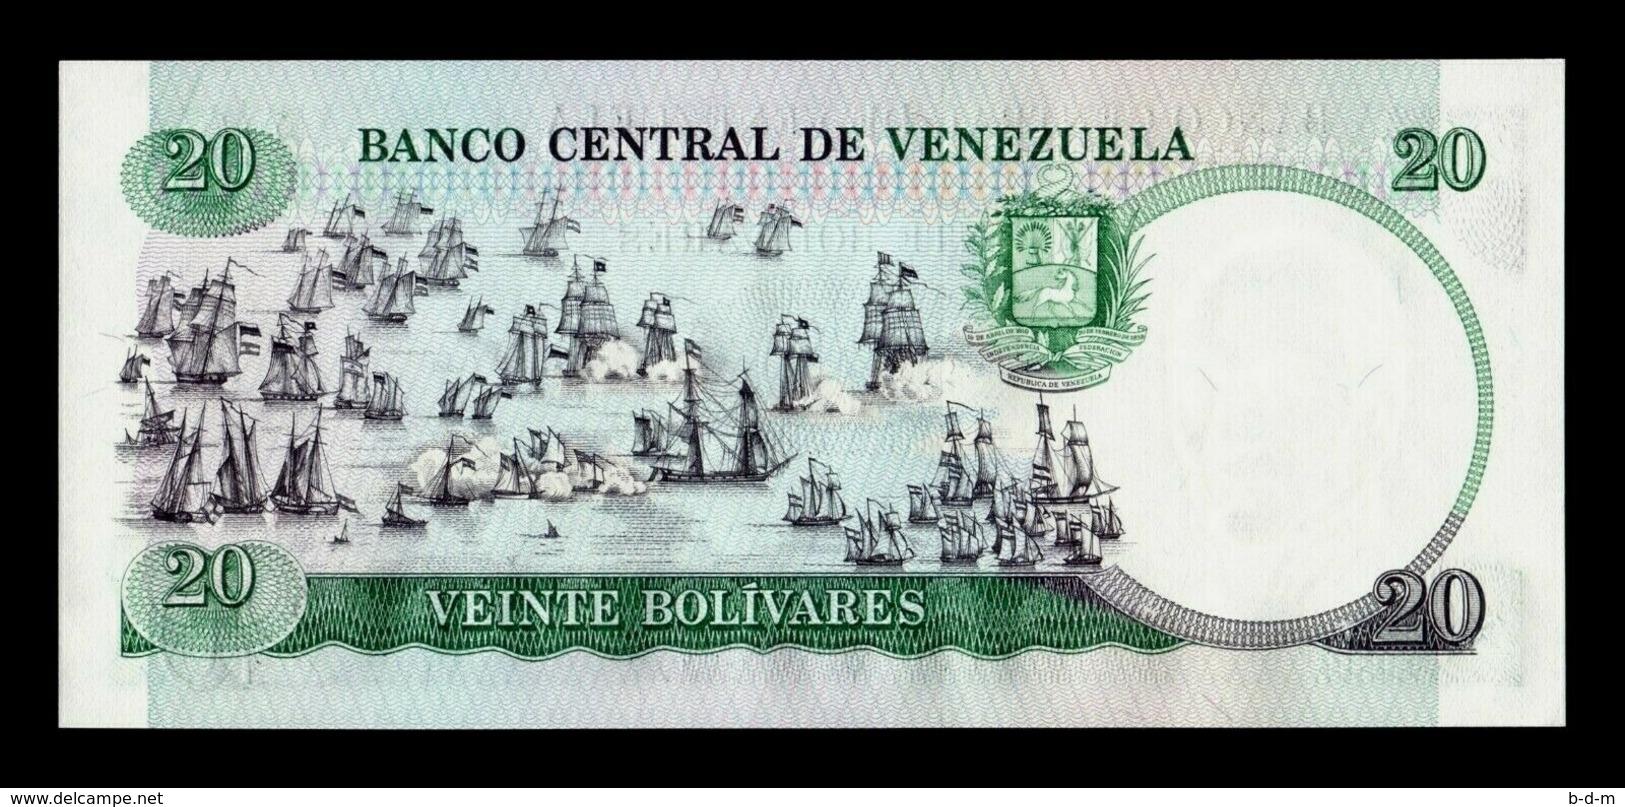 Venezuela 20 Bolivares Comm. 1987 (1989) Pick 71 Low Serial SC UNC - Venezuela